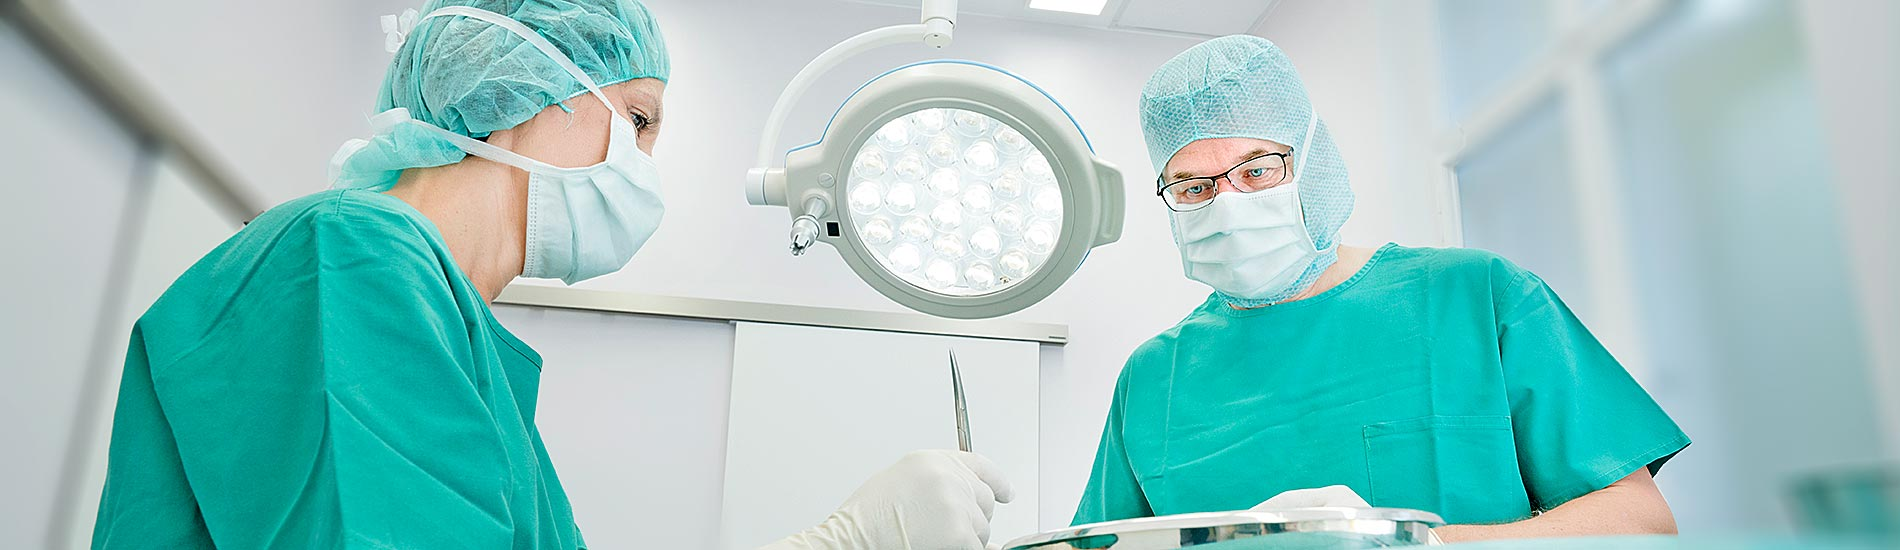 Chirurgische Praxis am Spreebogen – Dr. Jörg Müller beim Operieren